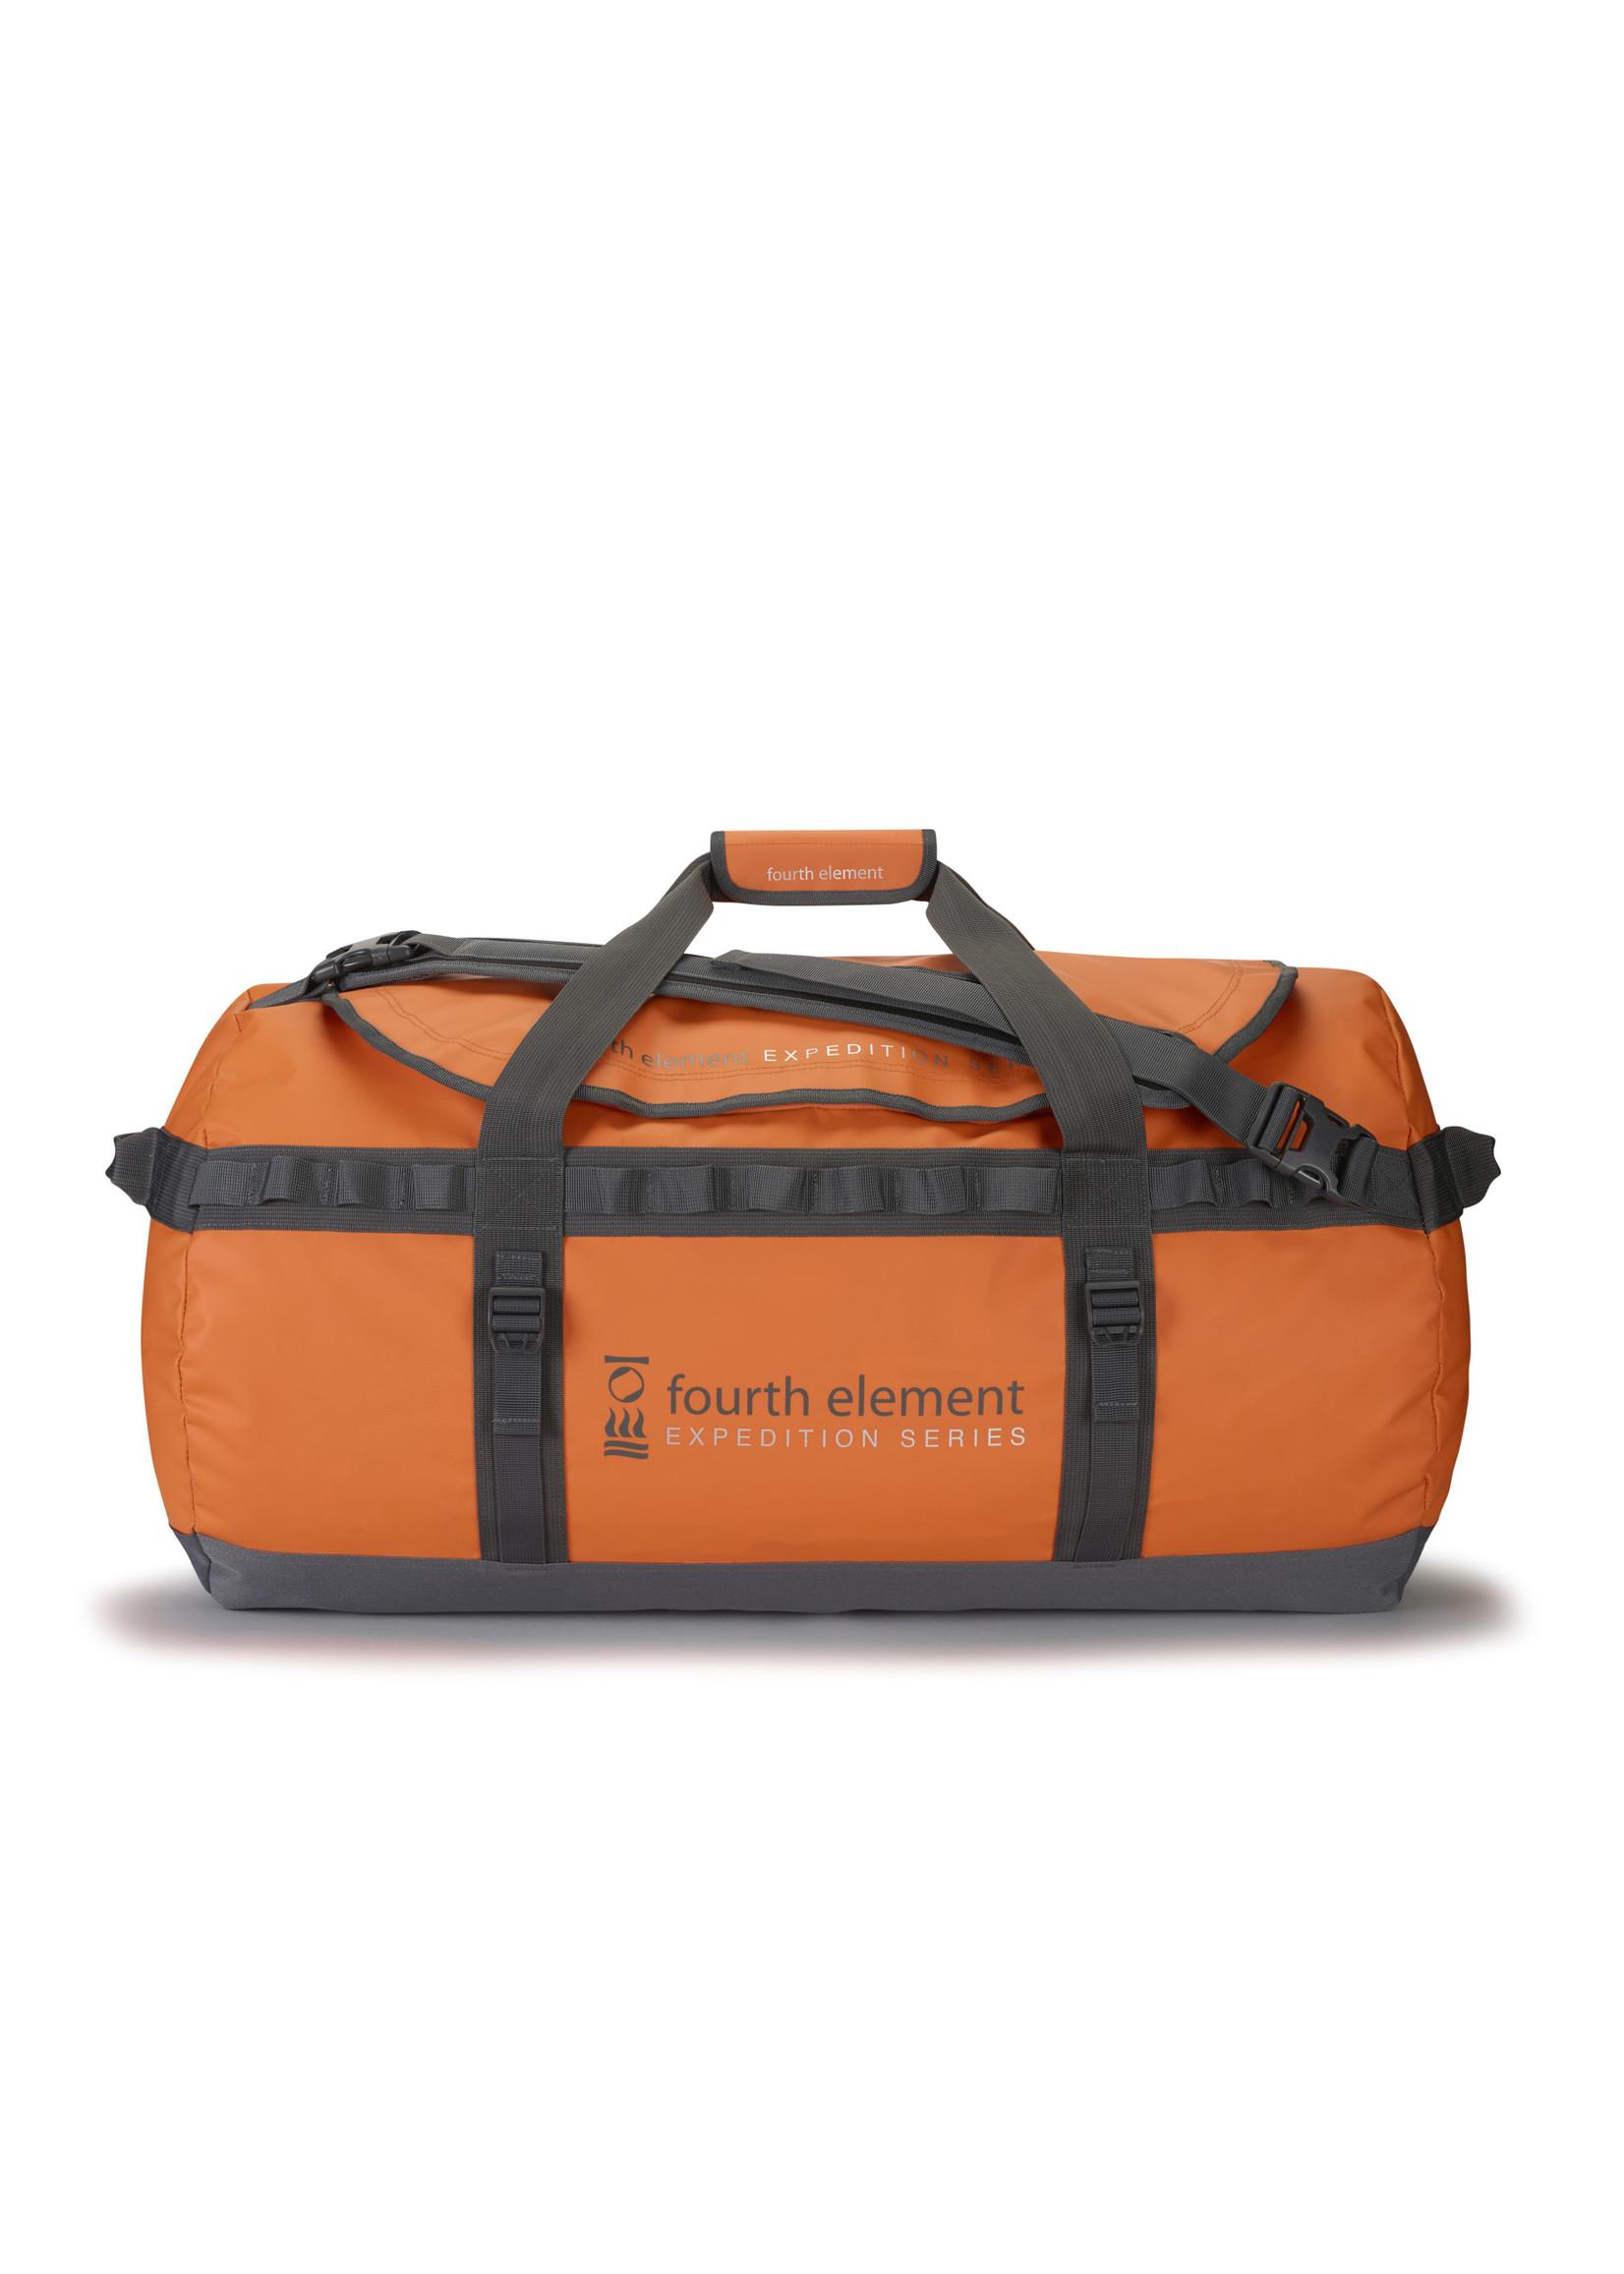 Fourth Element Fourth Element Expedition Series Duffel Bag 90L - Orange